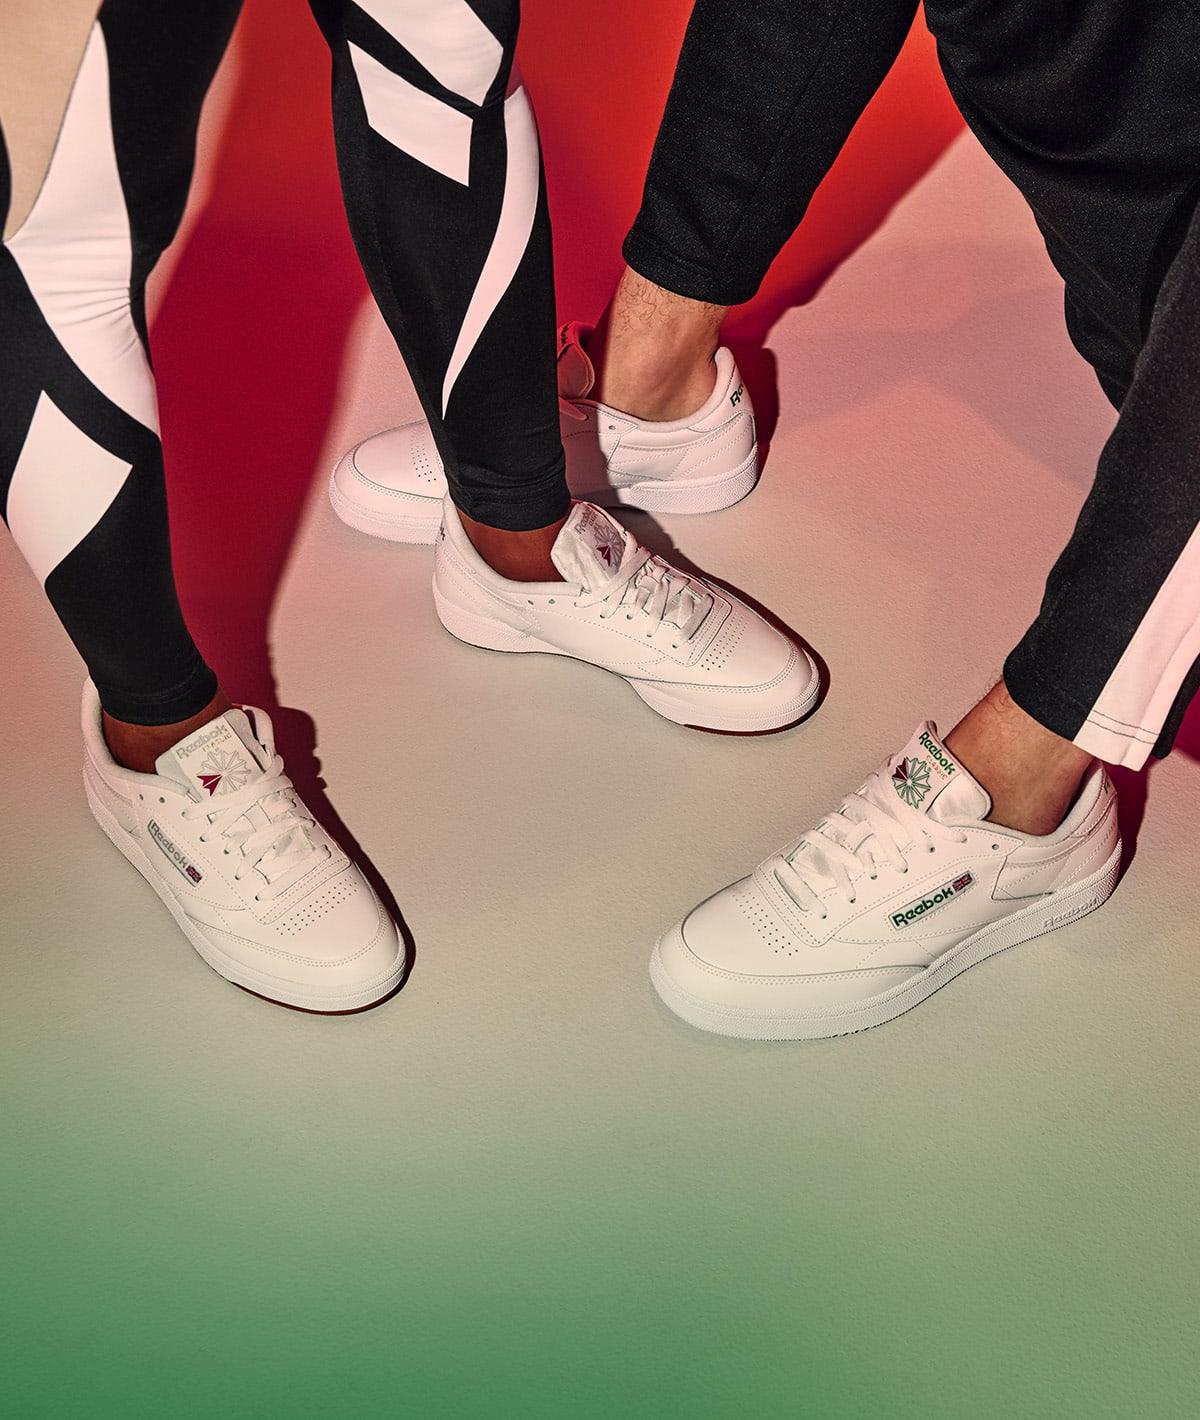 Sneakerheads and Sneaker Lovers 2019